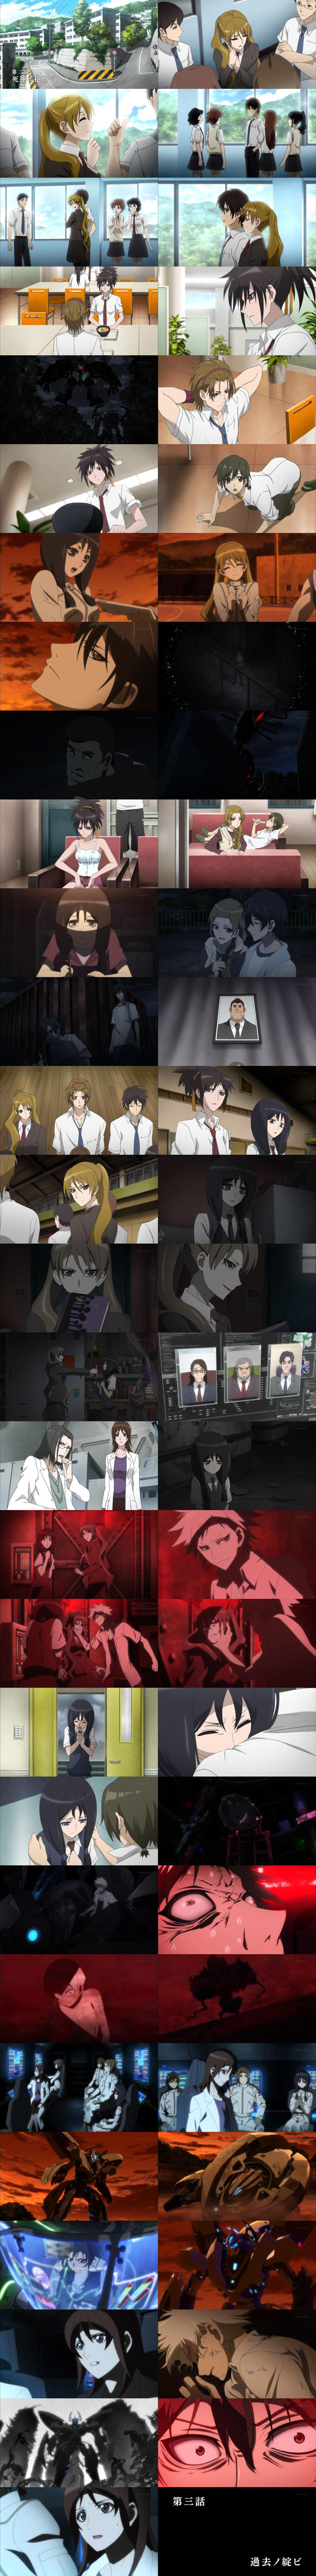 『M3 〜ソノ黒キ鋼〜』 第2話感想まとめ…しかし暗すぎる・・・